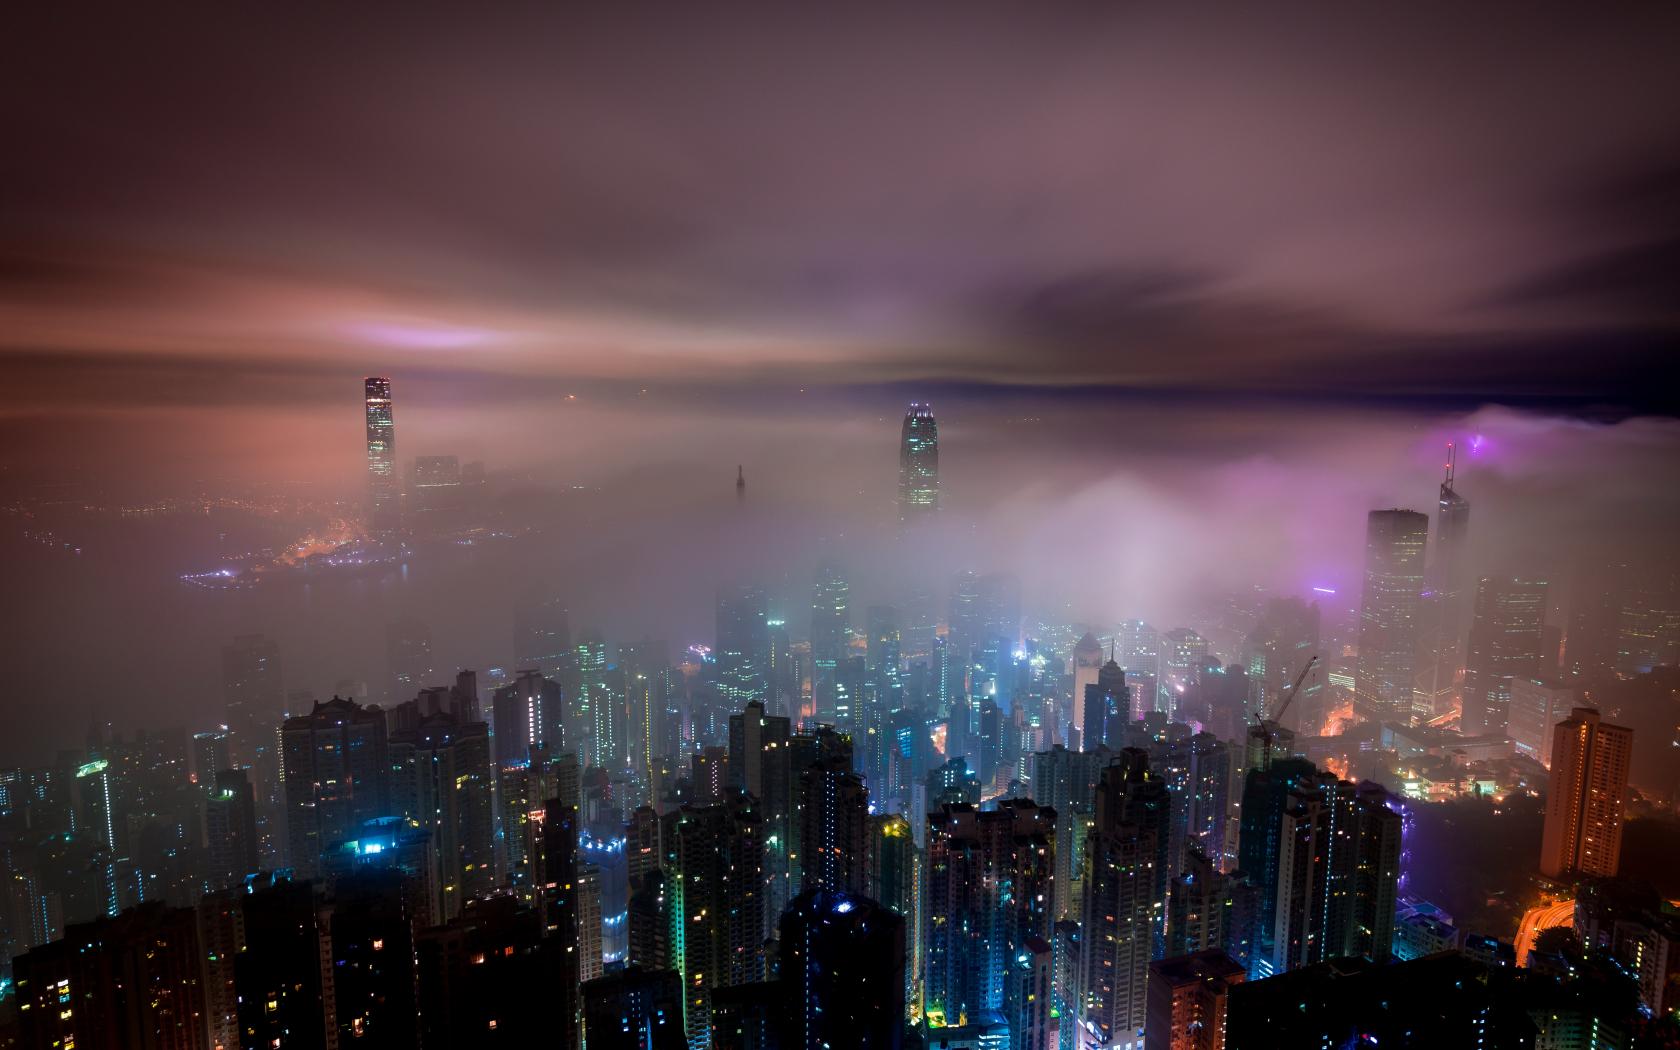 1680x1050 wallpaper Clouds, aerial view, hong kong, city, night, buildings, mist